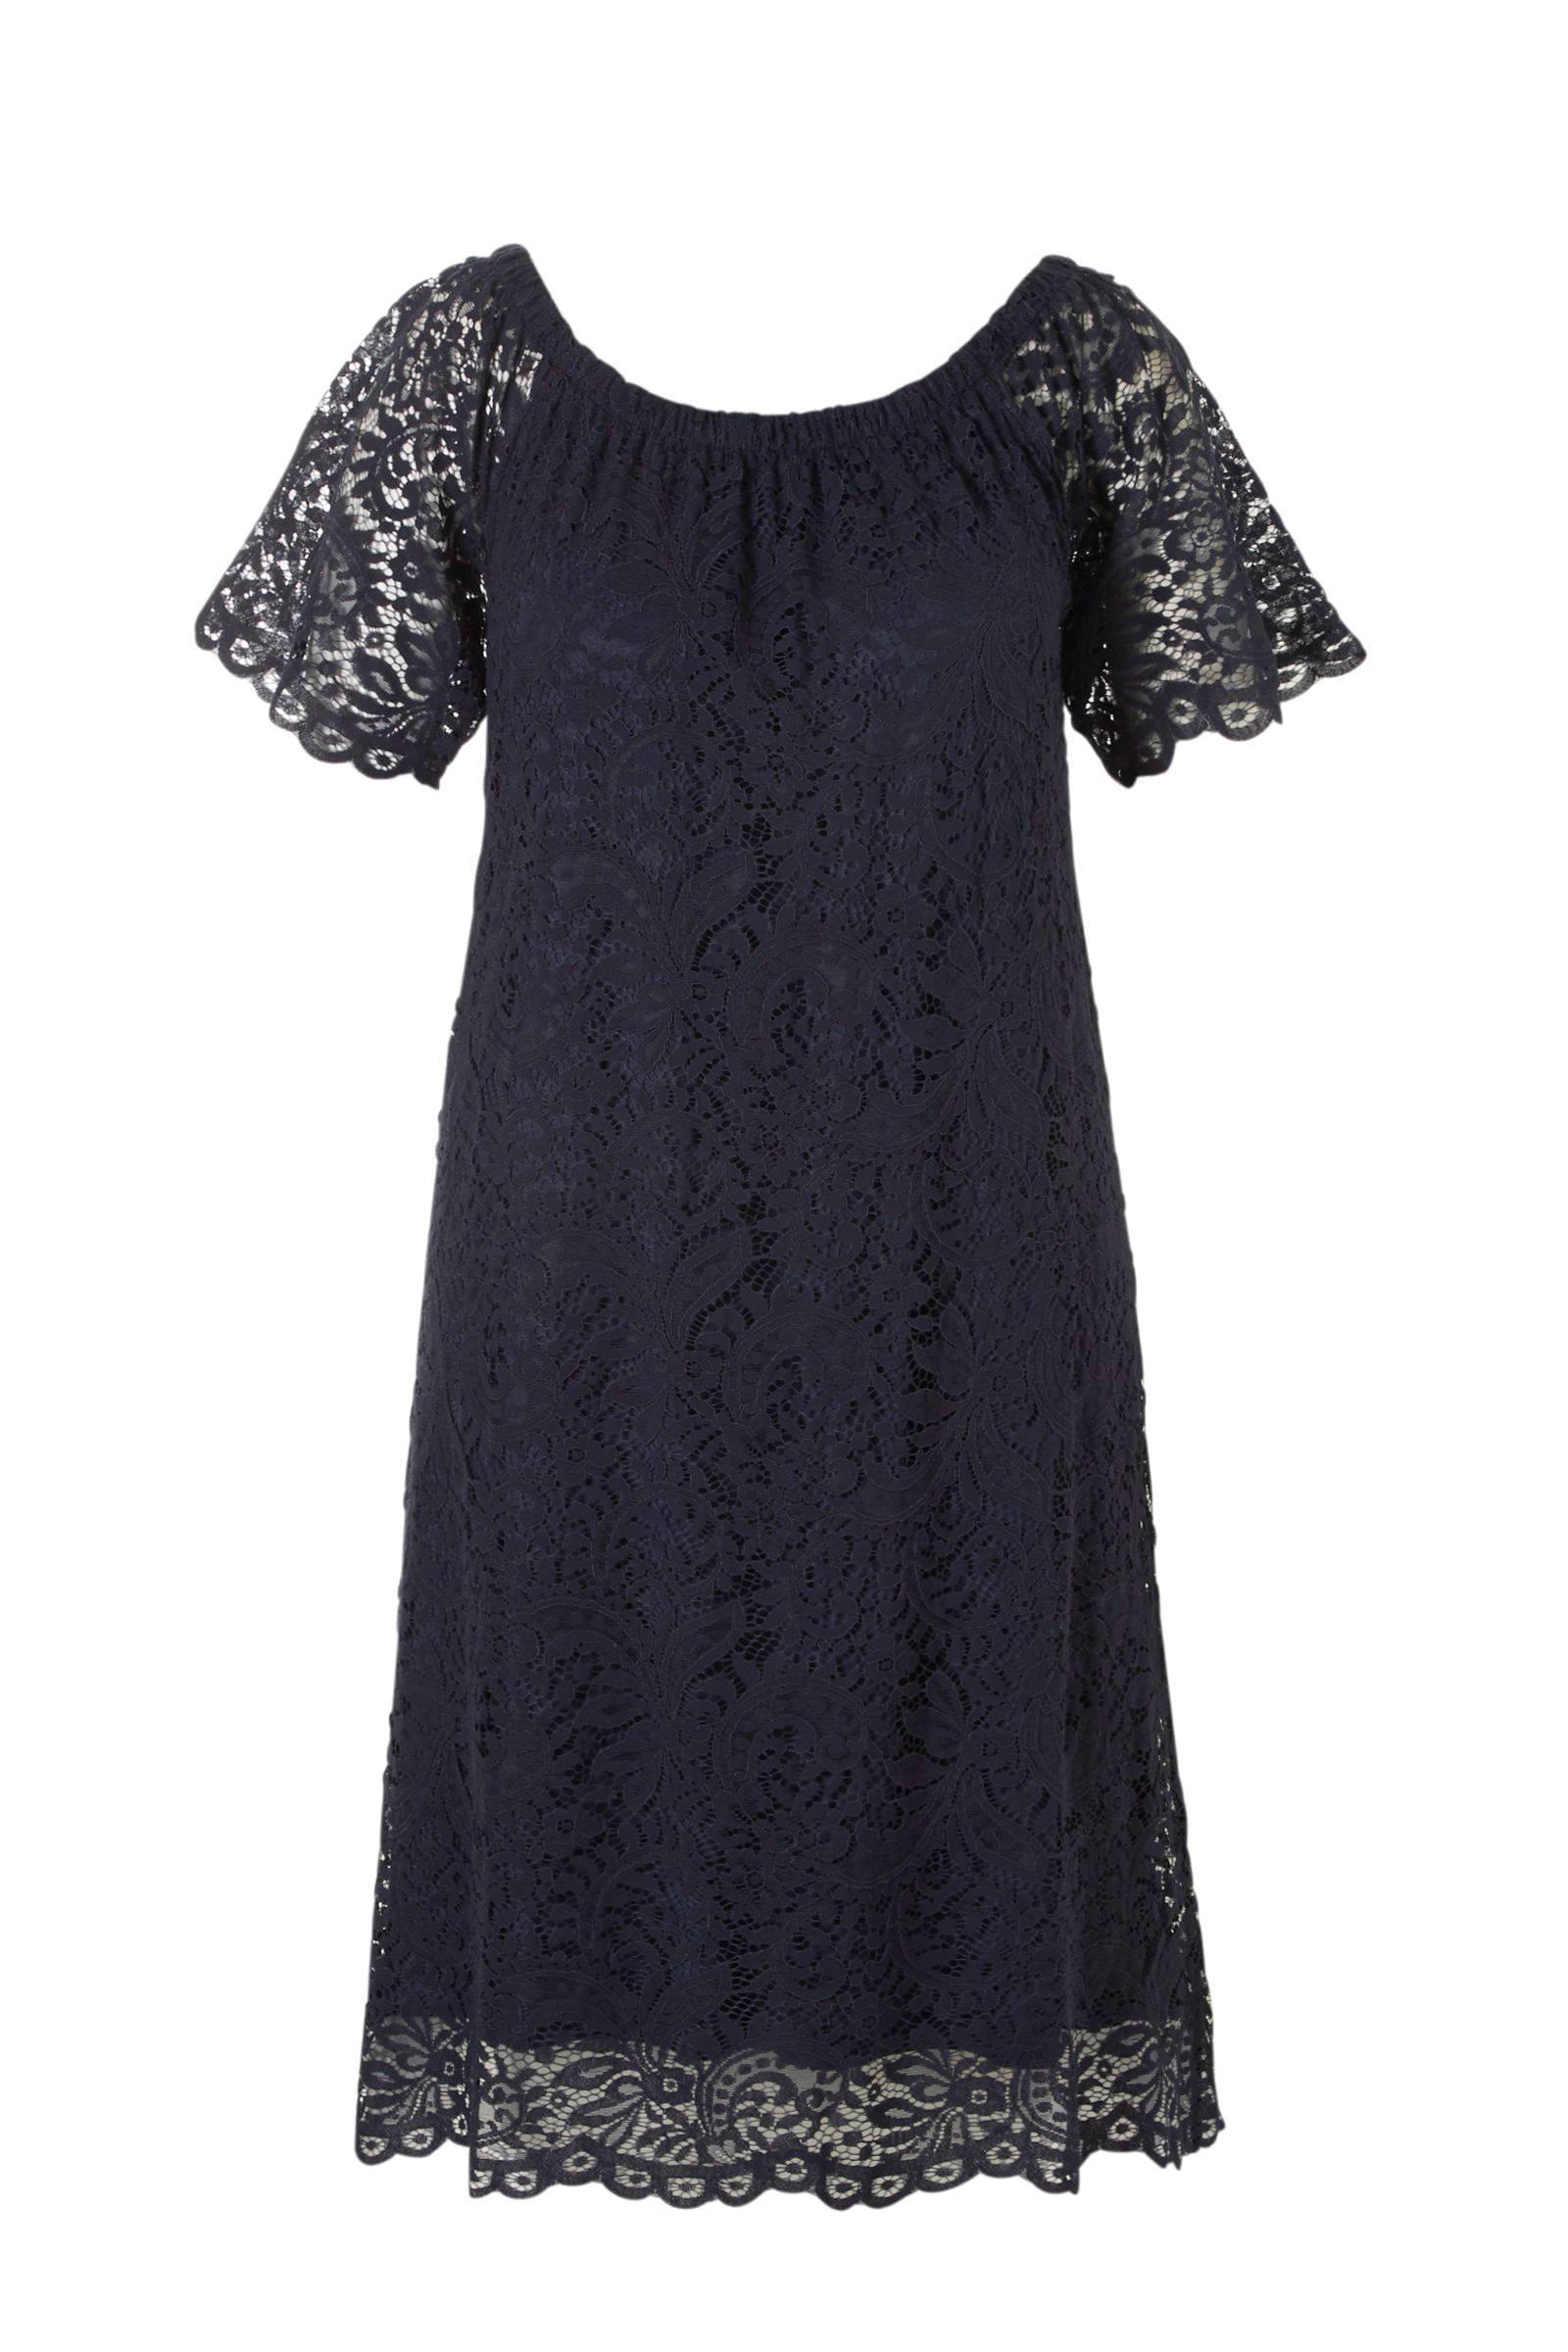 lange zwarte jurk maat 48